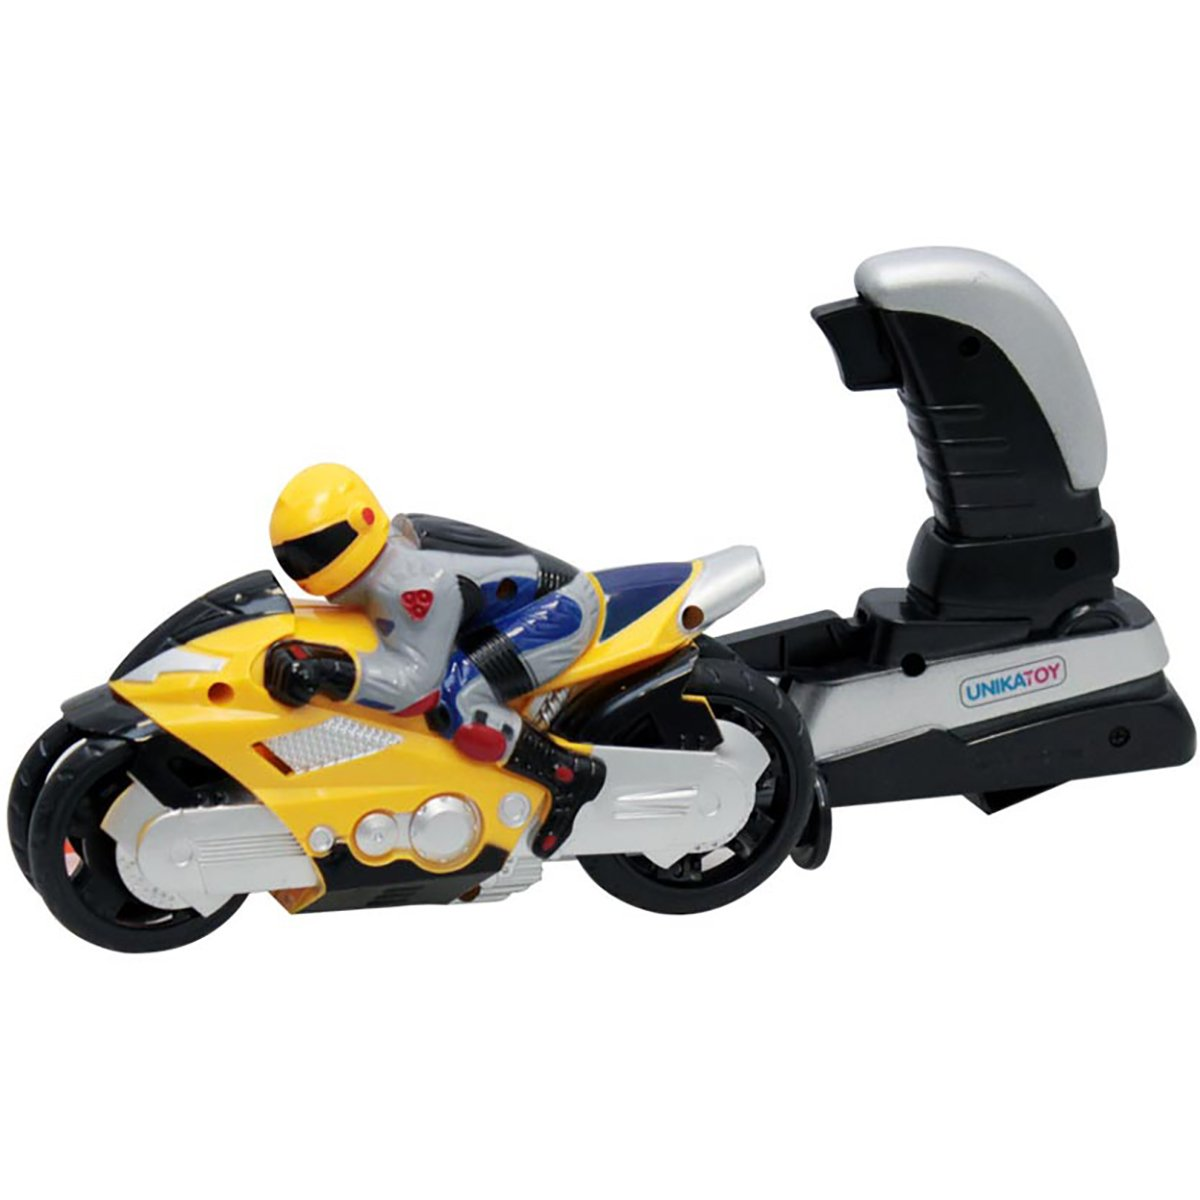 Motocicleta cu figurina si lansator Unika Toy, Galben